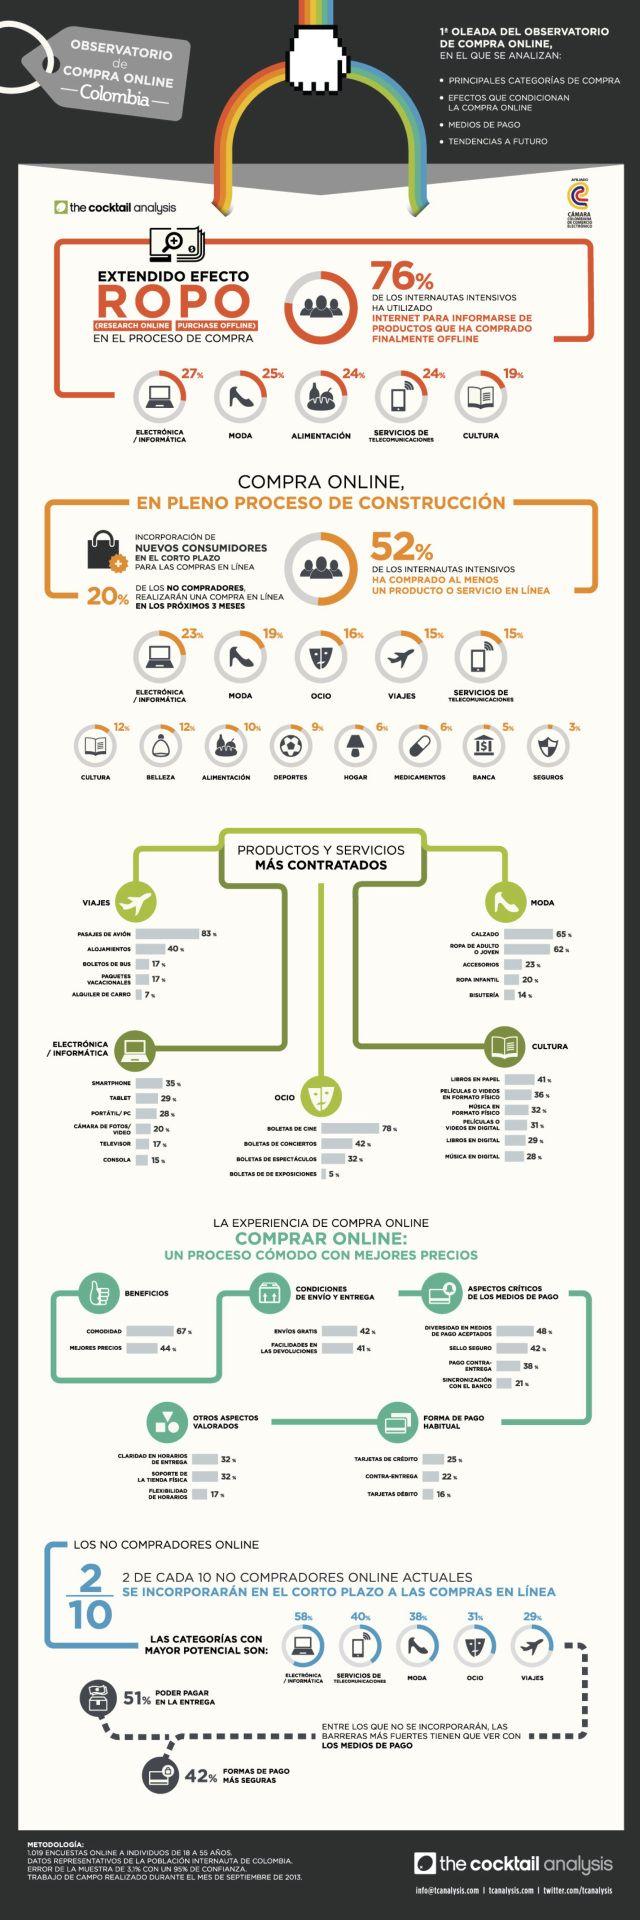 Comercio electrónico en Colombia #infografia #infographic #ecommerce